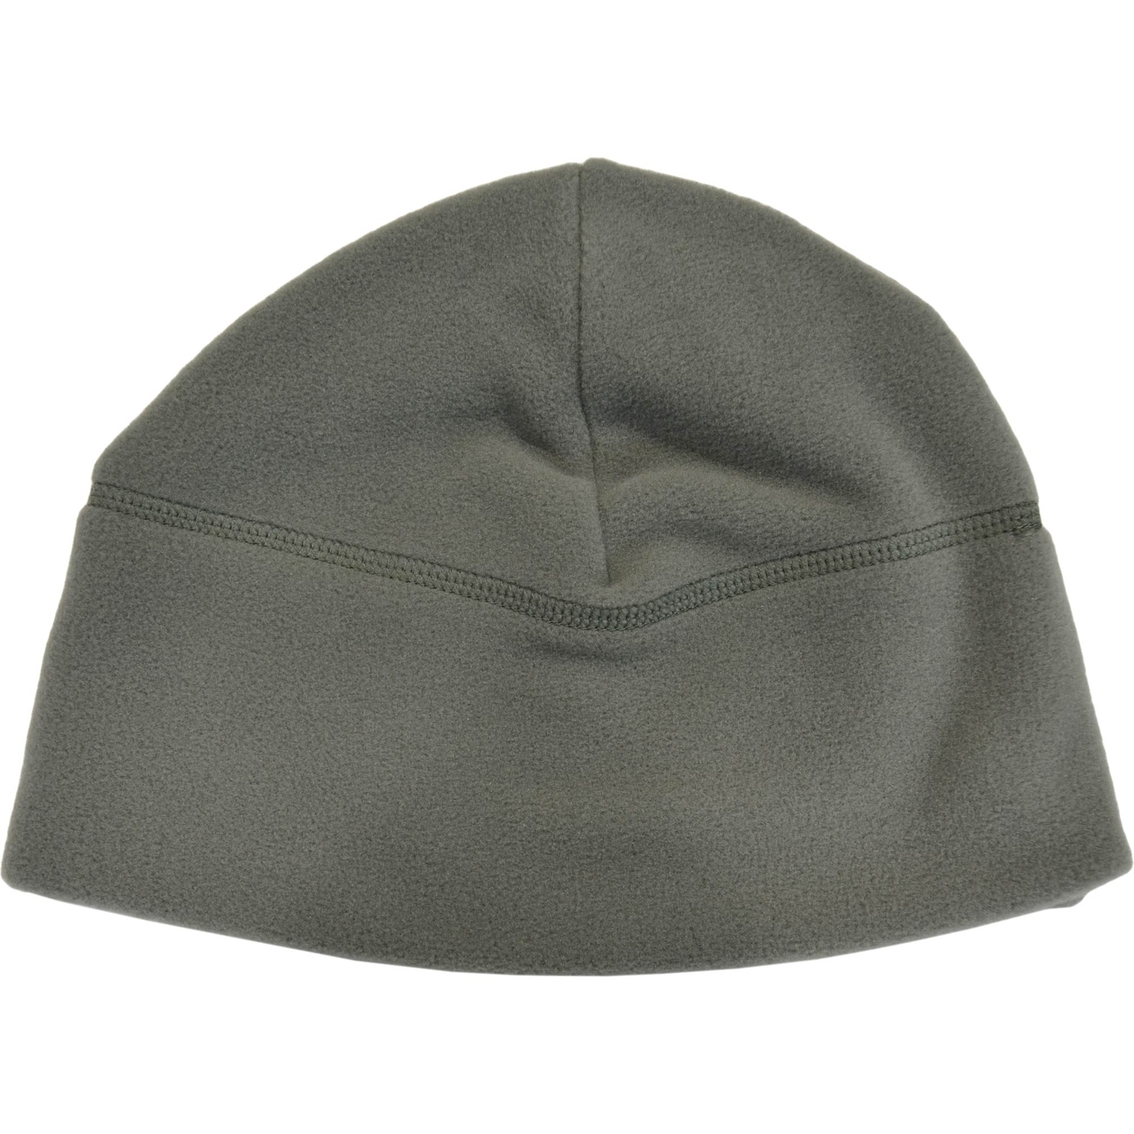 110a143d9a3cf Brigade Qm Polartec 100 Military Classic Military Microfleece Cap ...